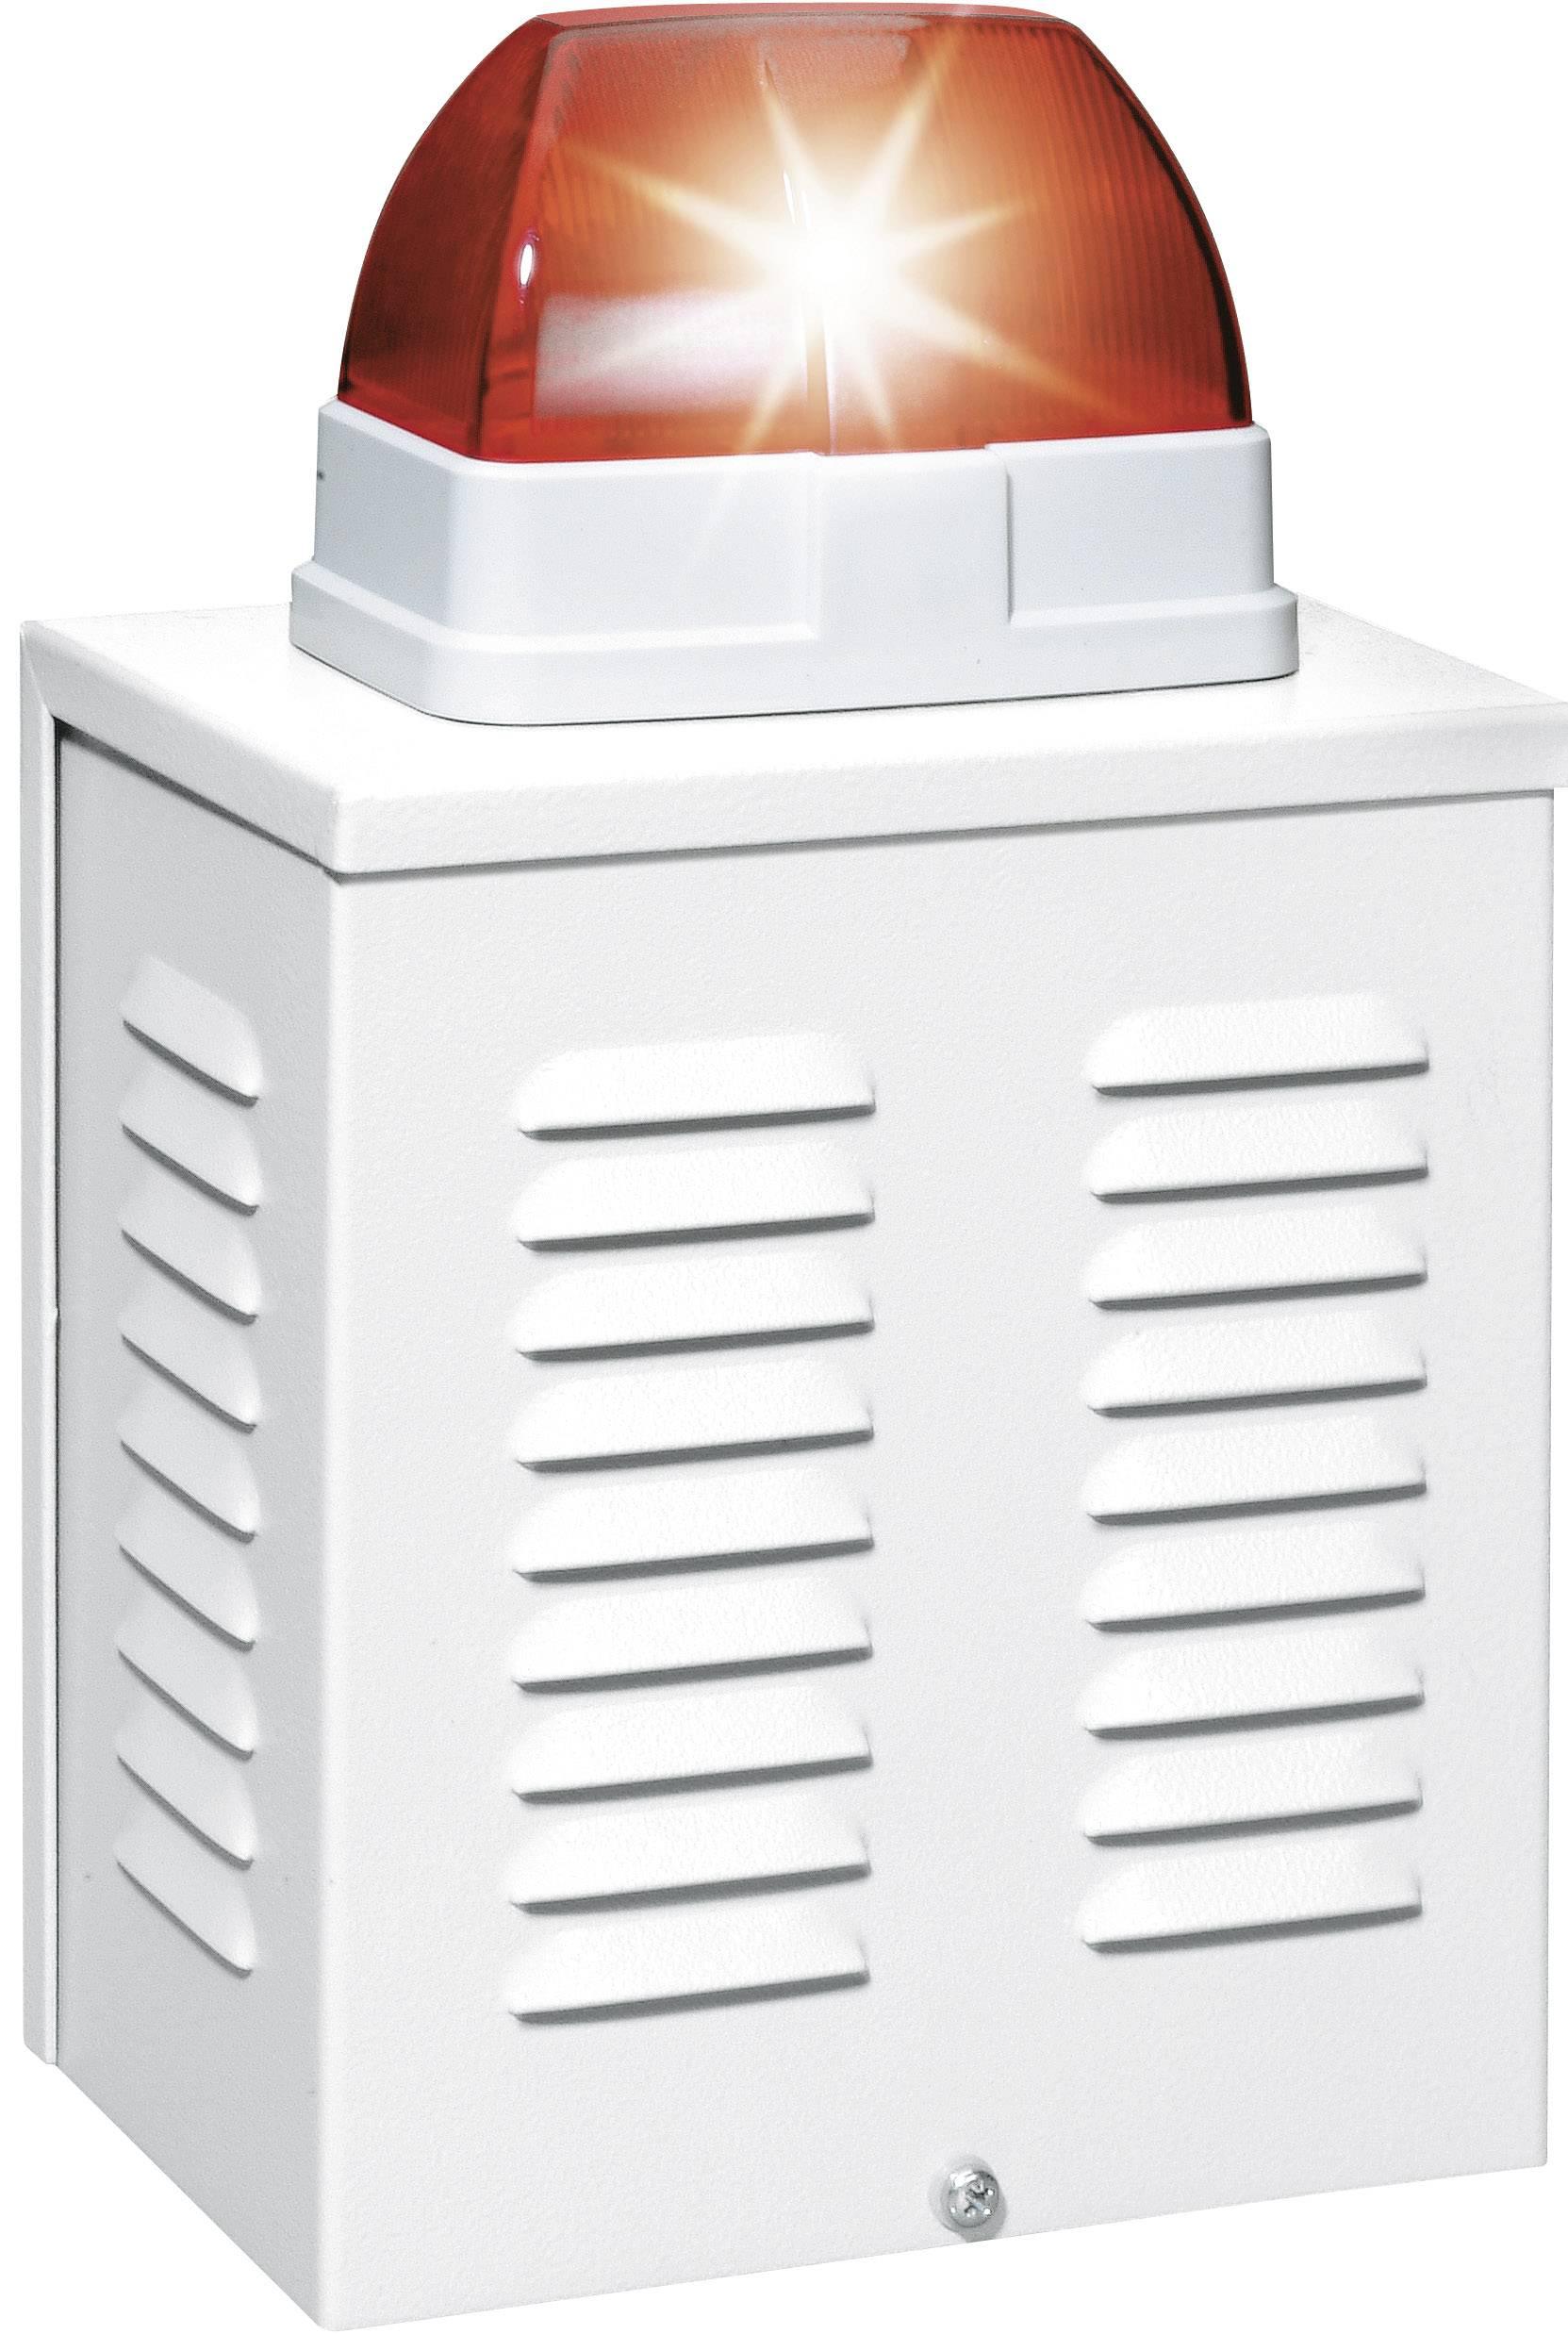 Siréna s optickou signalizáciou SG1650, 110 dB ABUS